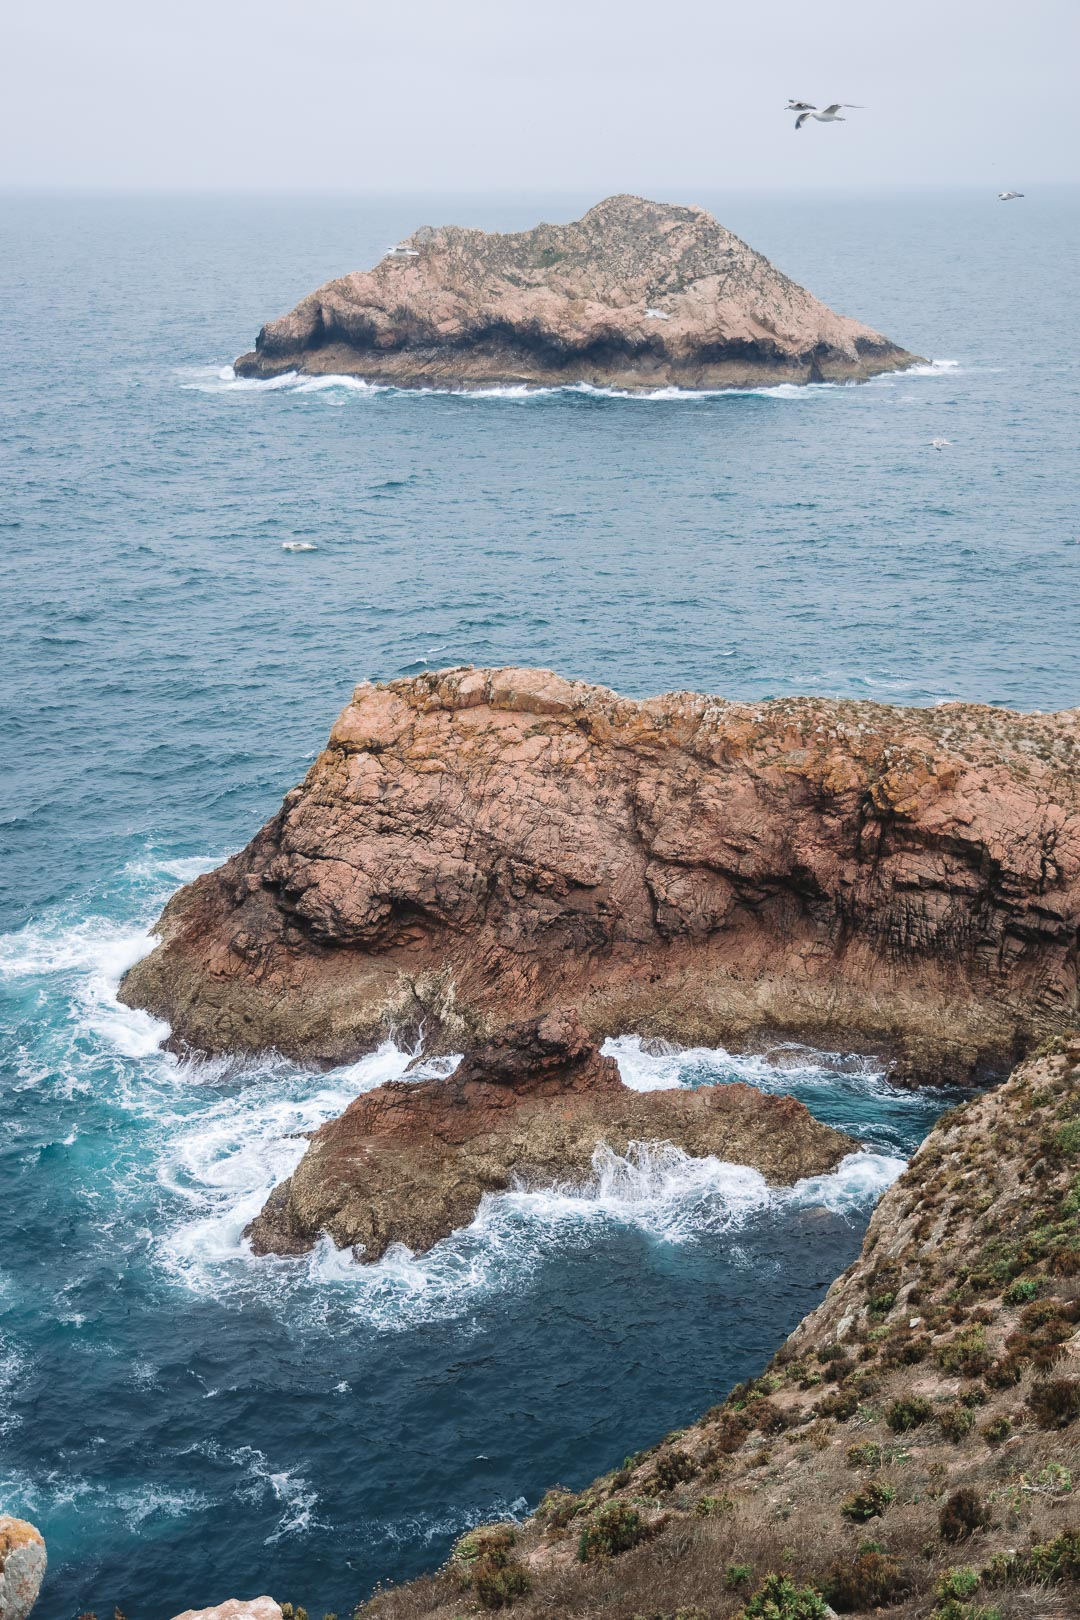 The dramatic coastline of the Berlengas Islands on Berlenga Grande